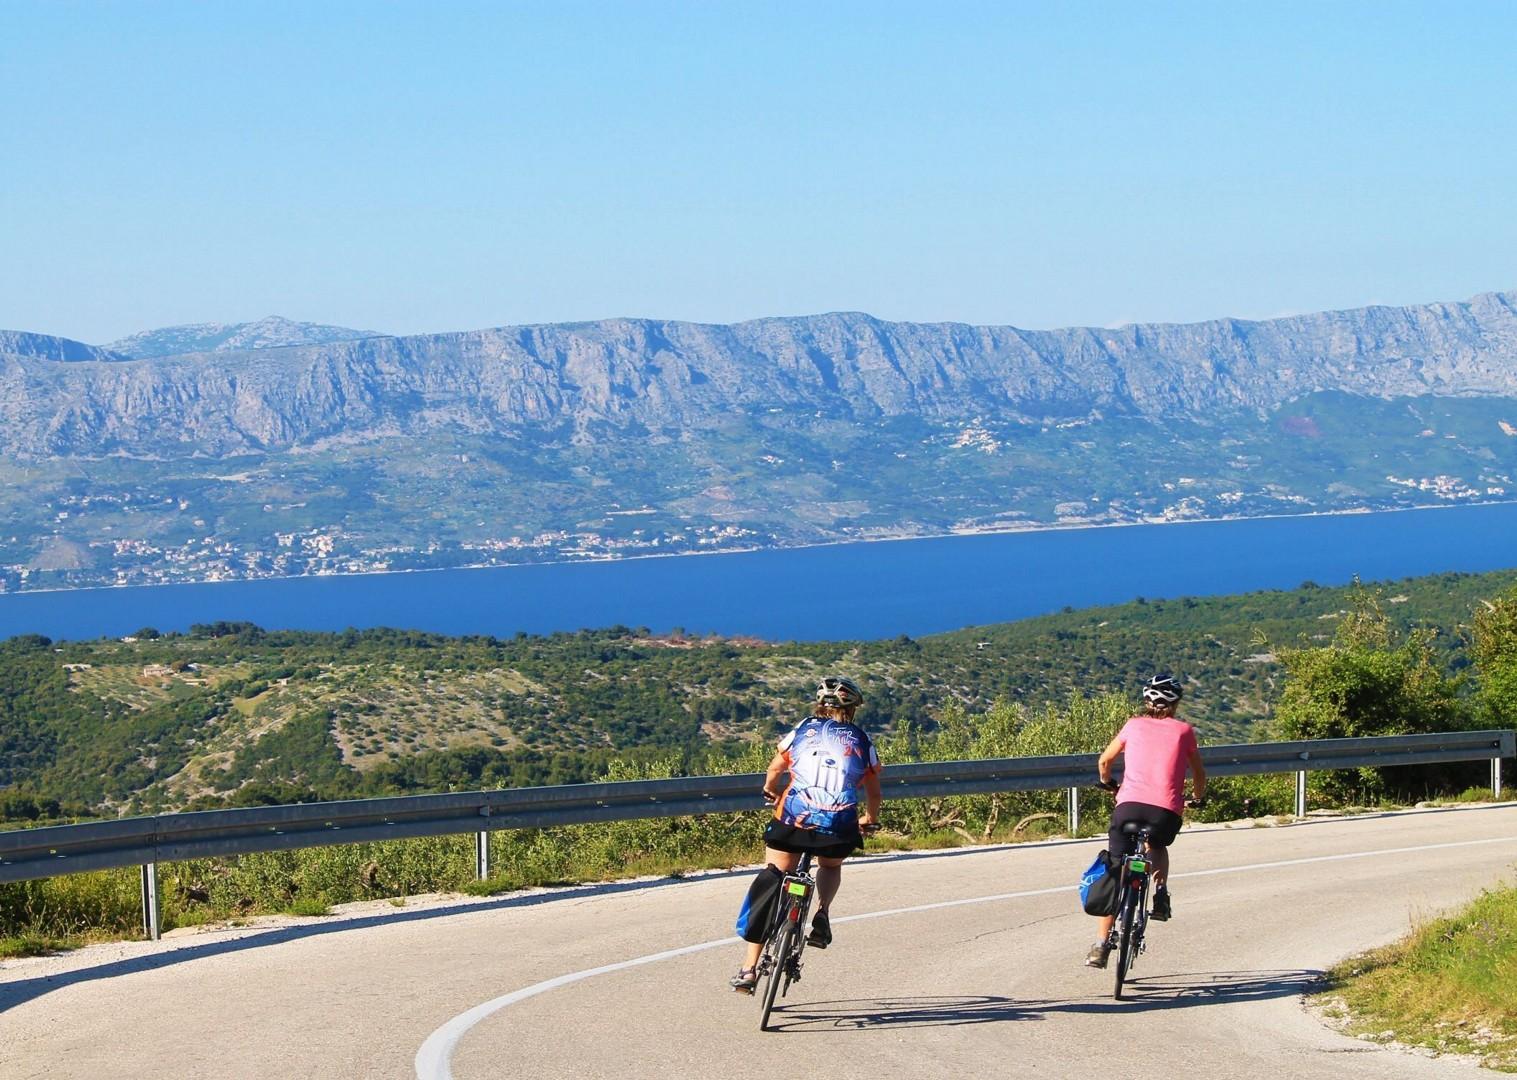 croatia-national-parks-bike-and-boat-ebike.jpg - Croatia - Dalmatian National Parks and Islands Plus - Bike and Boat Holiday - Leisure Cycling